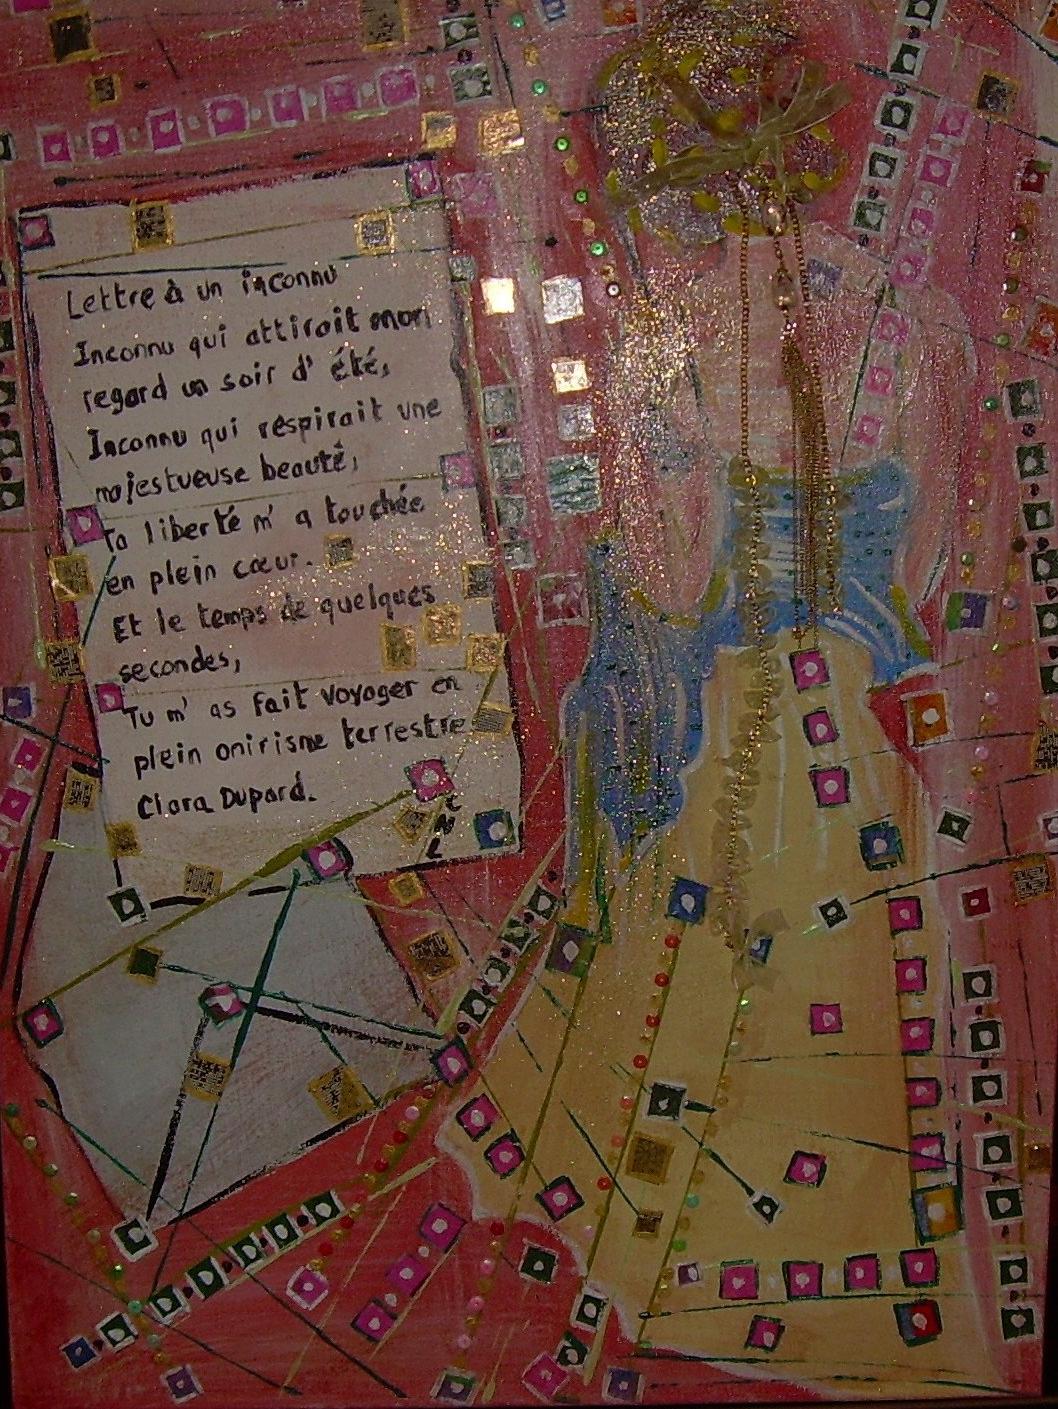 lettre-c3a0-un-inconnu-70x50cm-poc3a8me-clara-dupard-e1535915038574.jpg